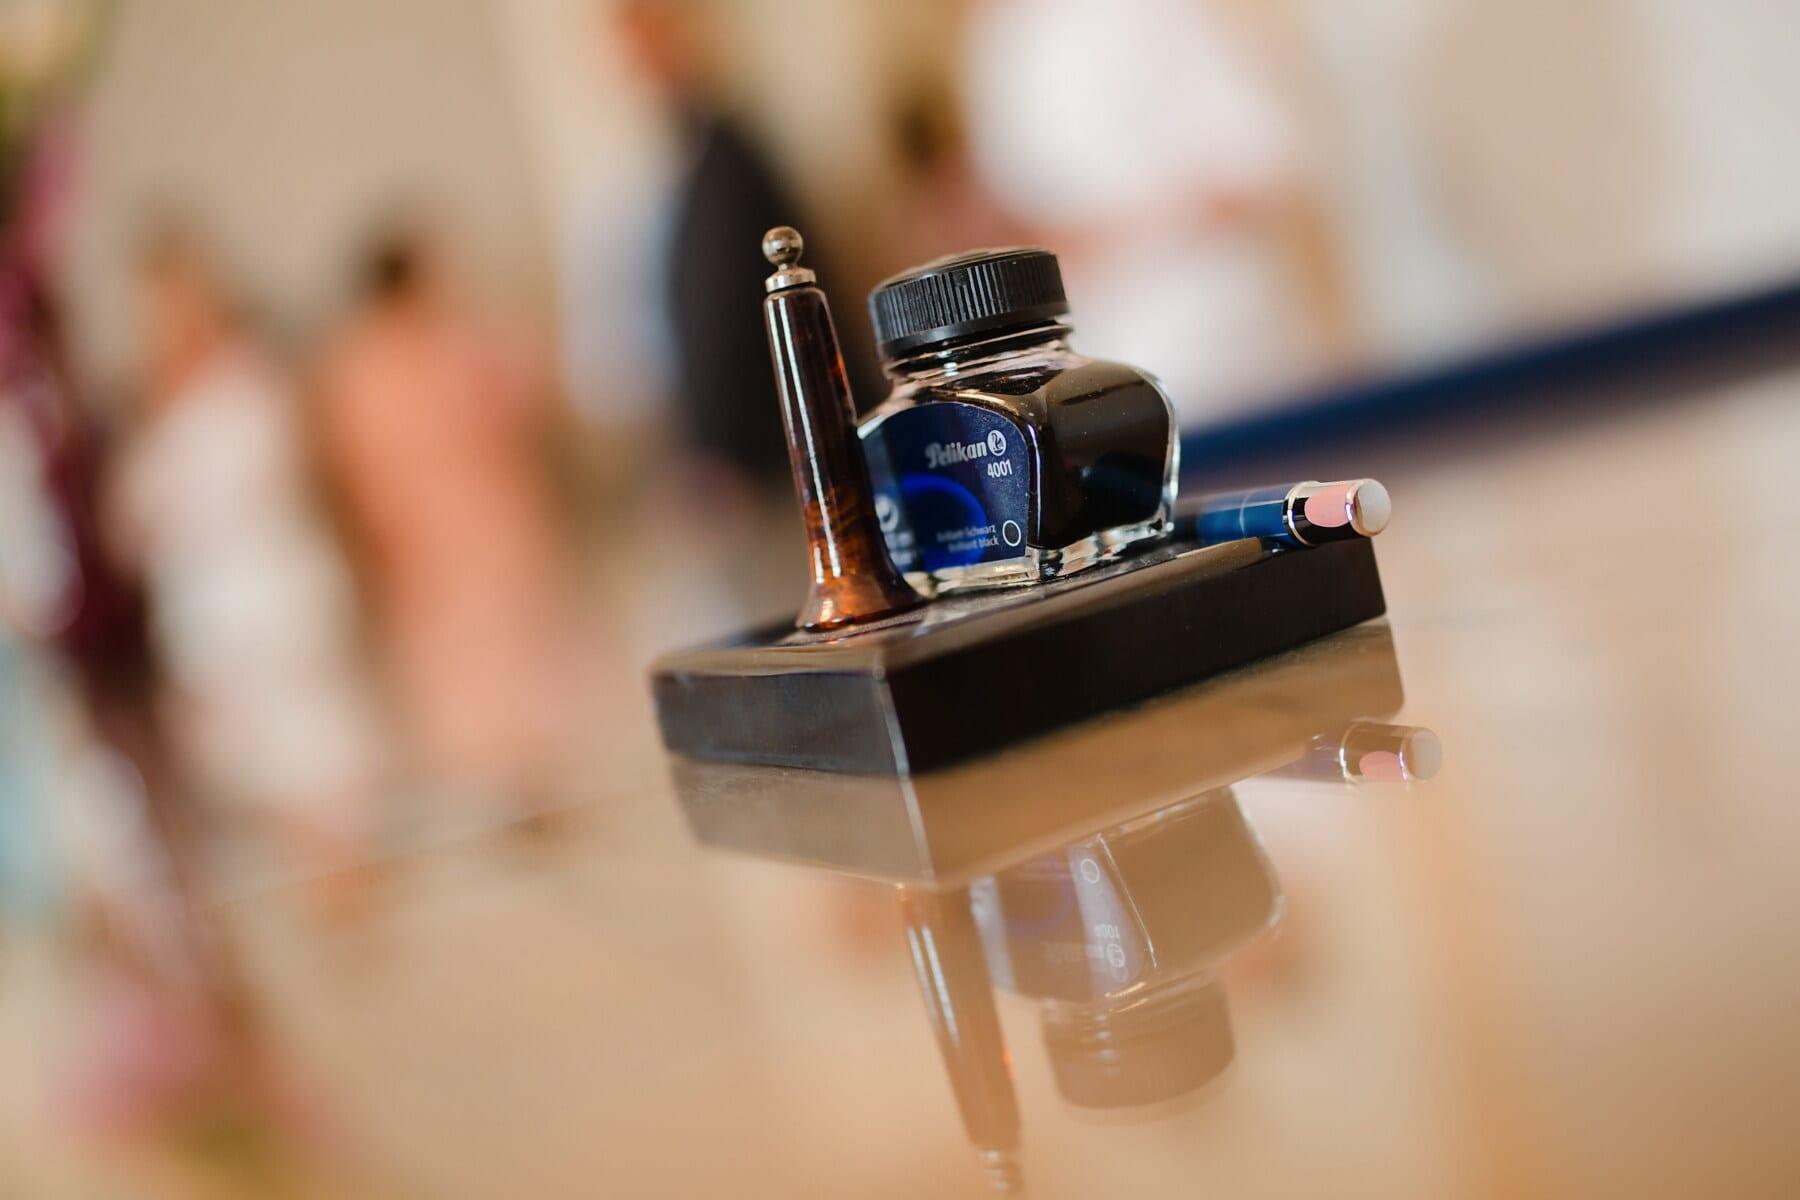 blue, ink, table, pencil, office, desk, indoors, blur, wood, elegant